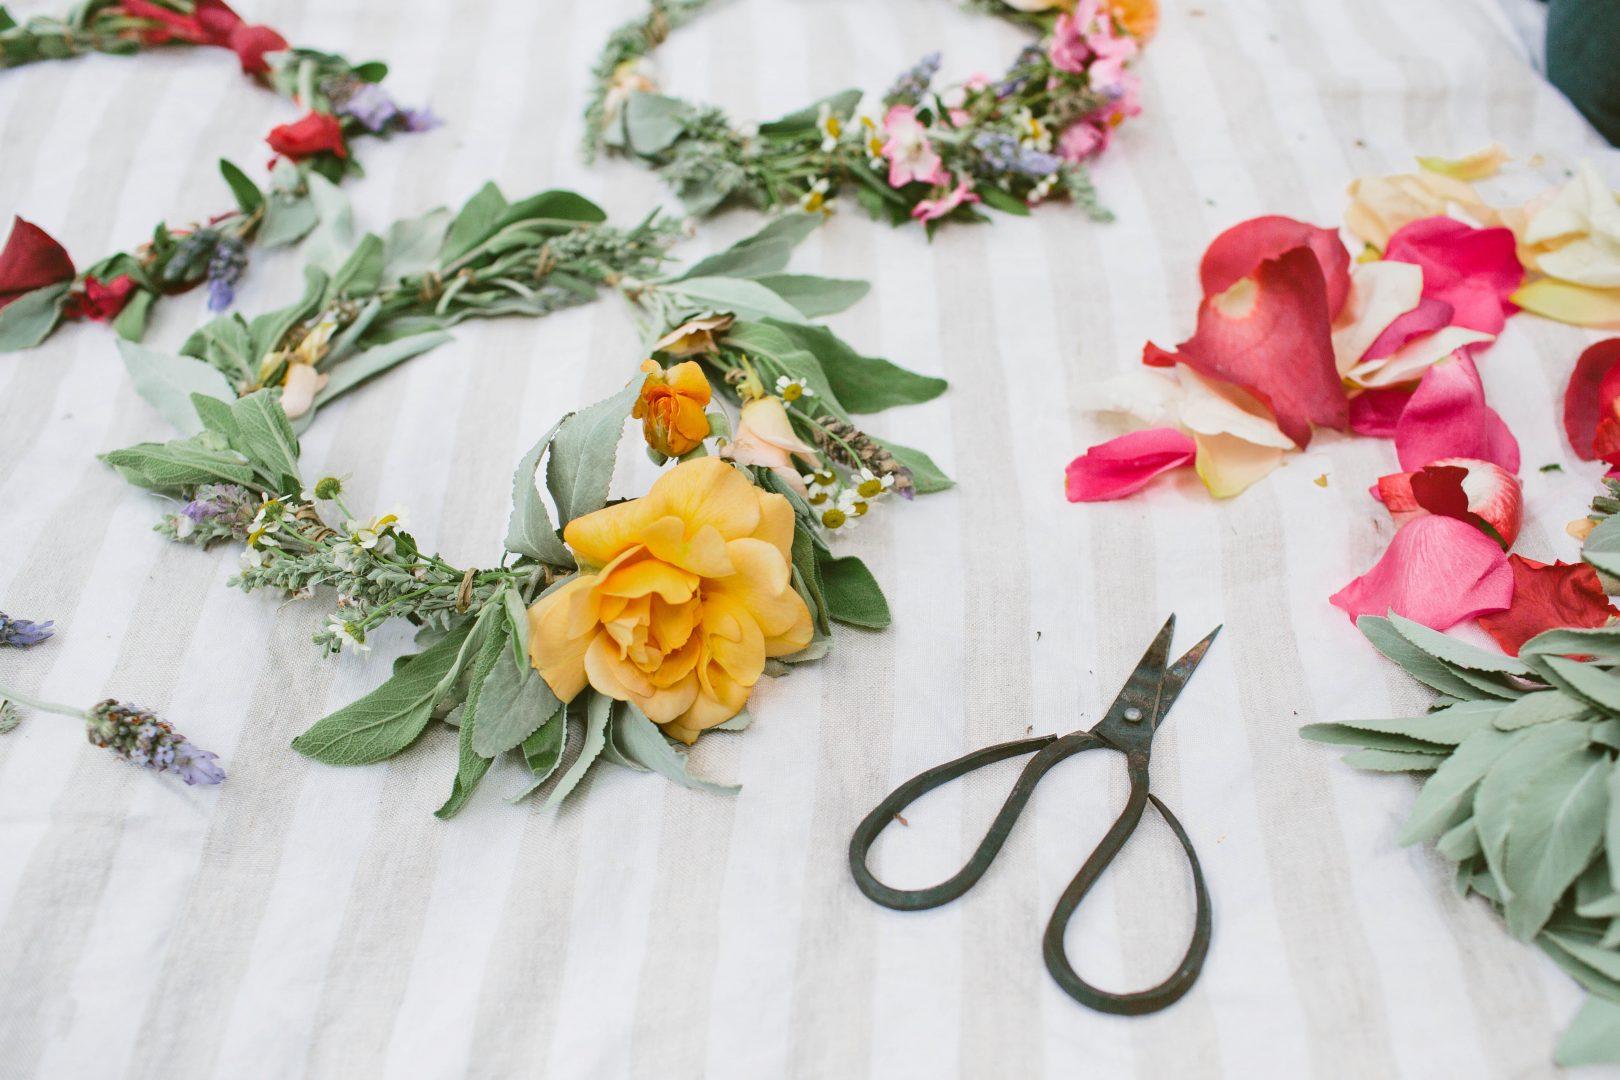 Diy floral crowns living rip tan diy floral crowns izmirmasajfo